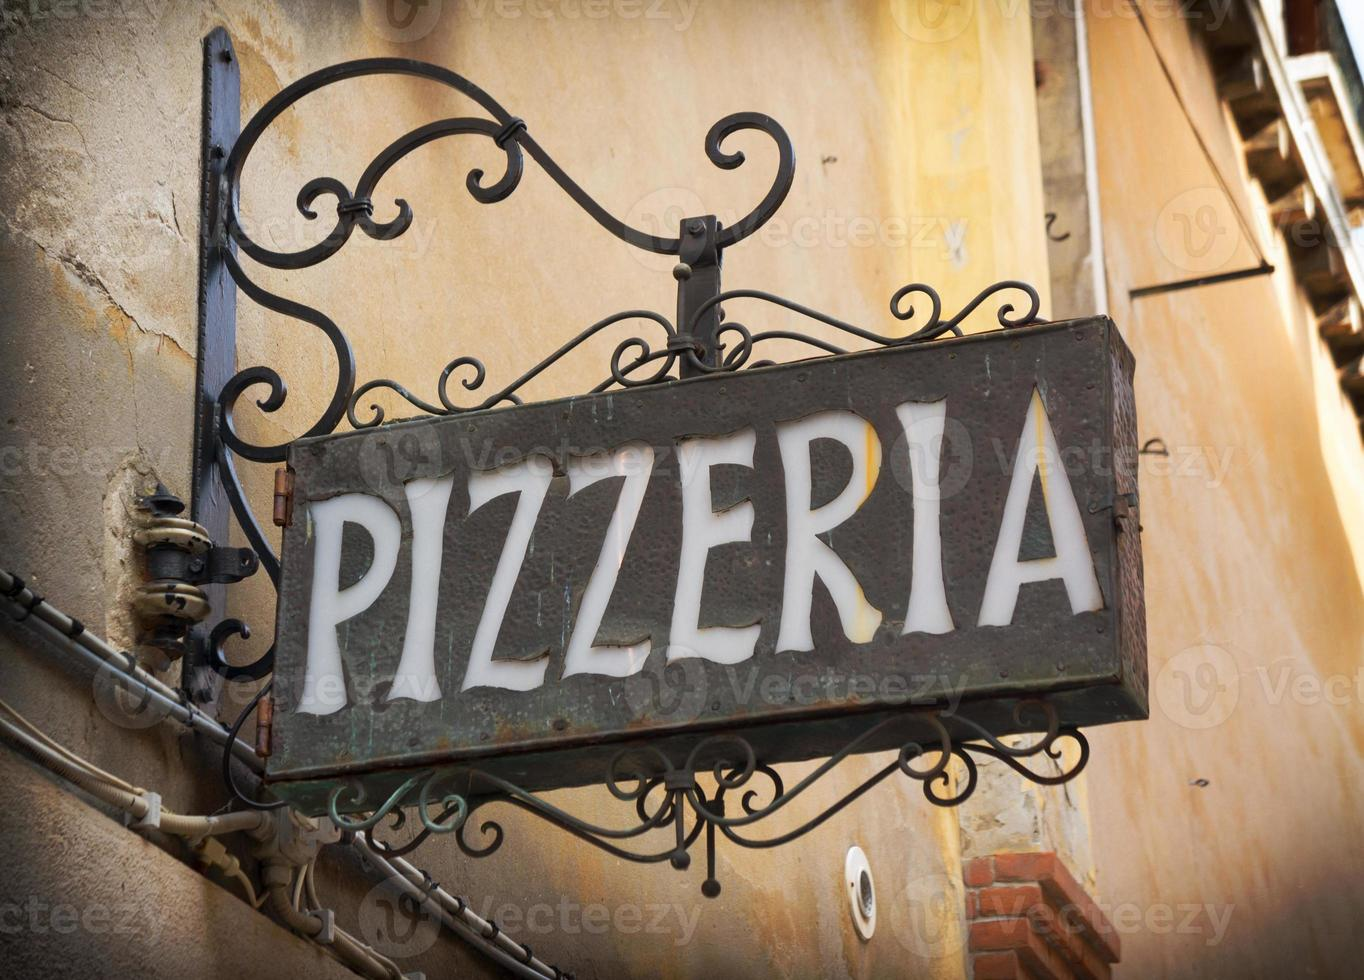 Pizzeria Zeichen in Venedig Italien foto